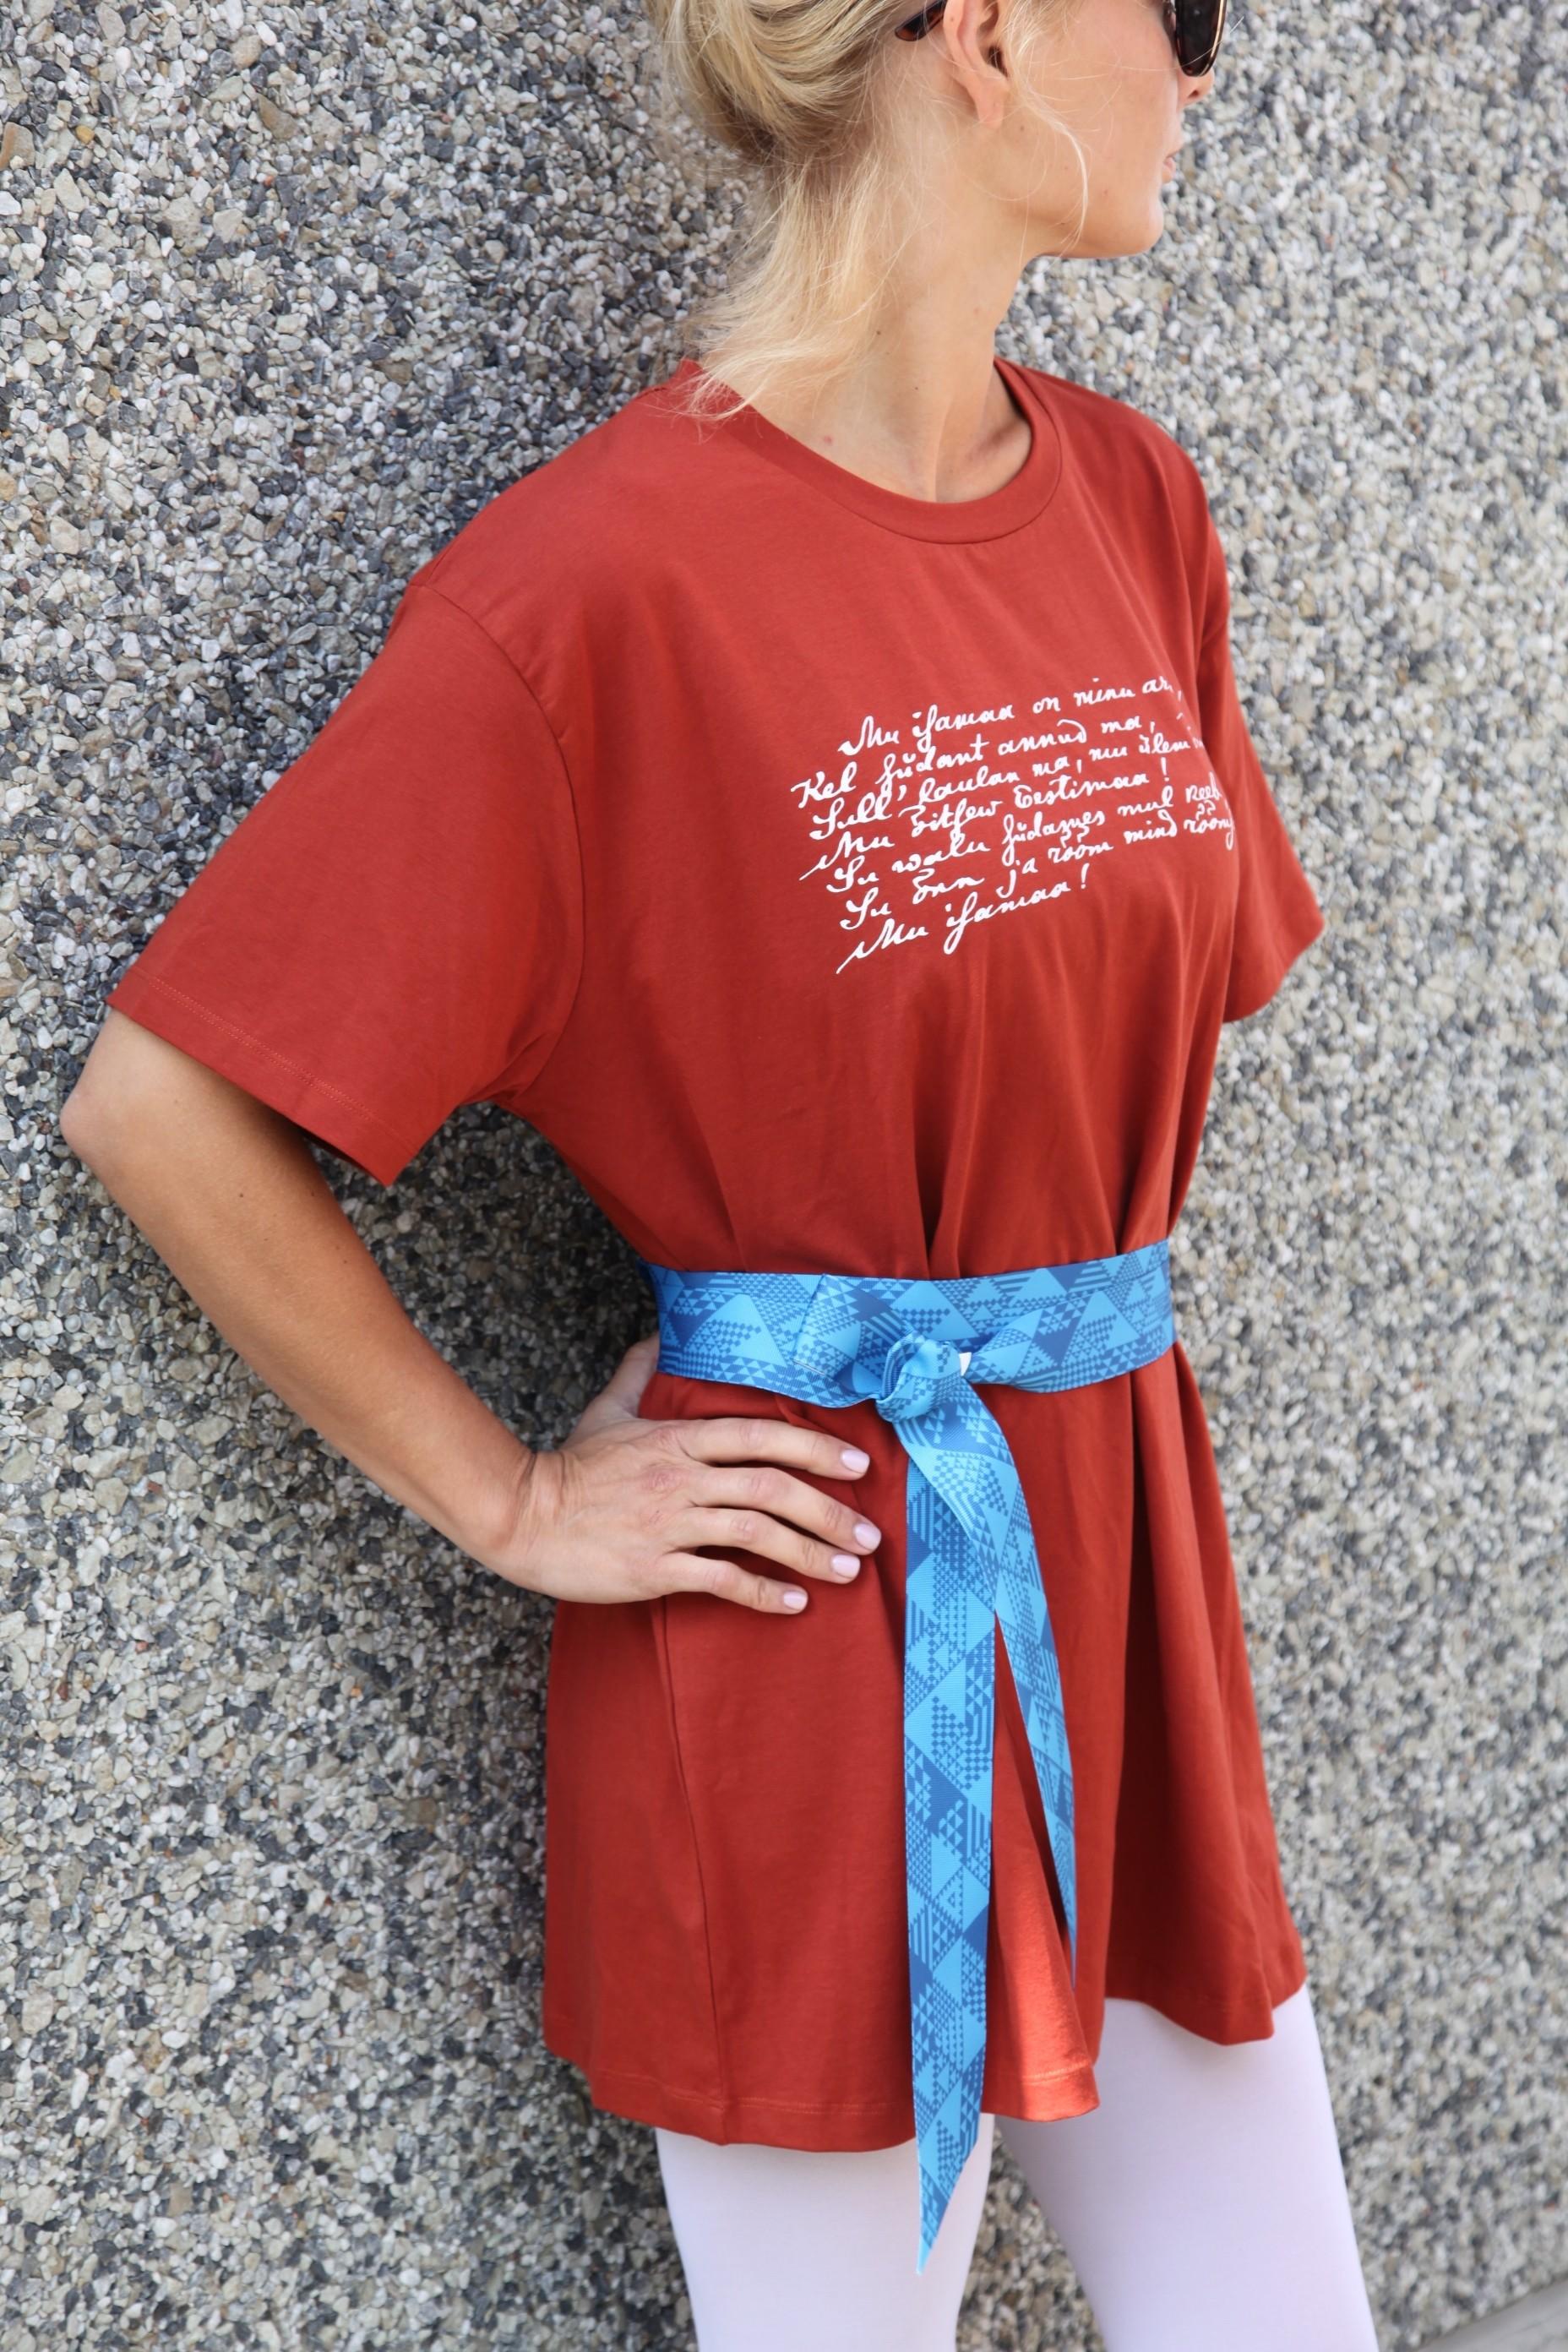 MINU ARM pruun kleit naistele